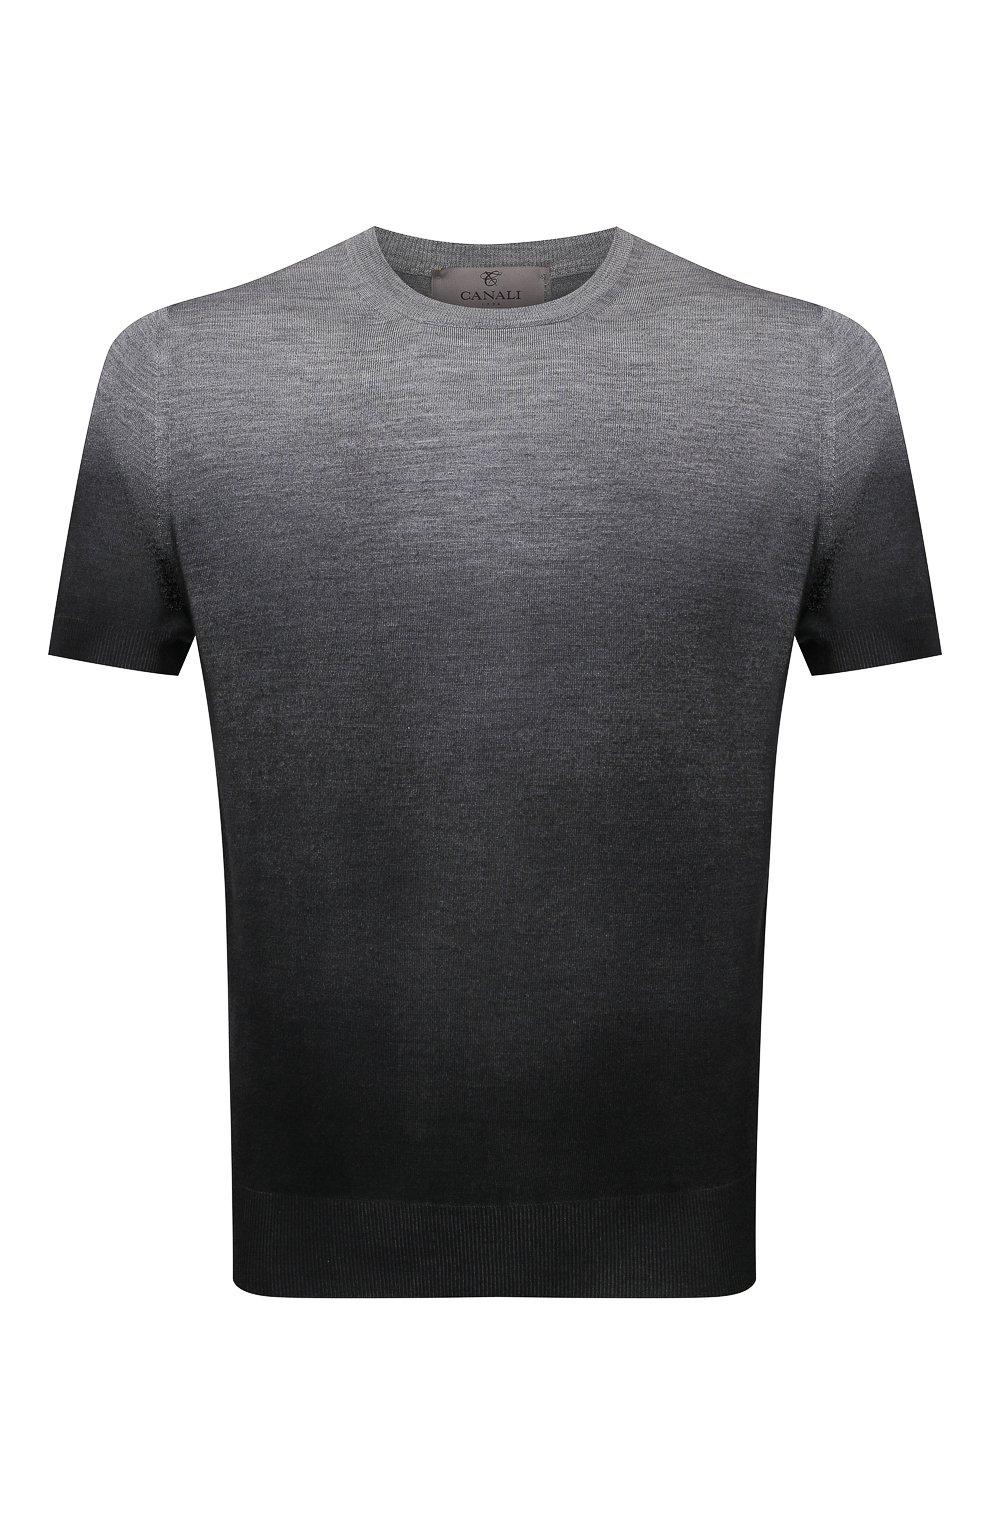 Мужской джемпер из шерсти и шелка CANALI серого цвета, арт. C0719/MX01166   Фото 1